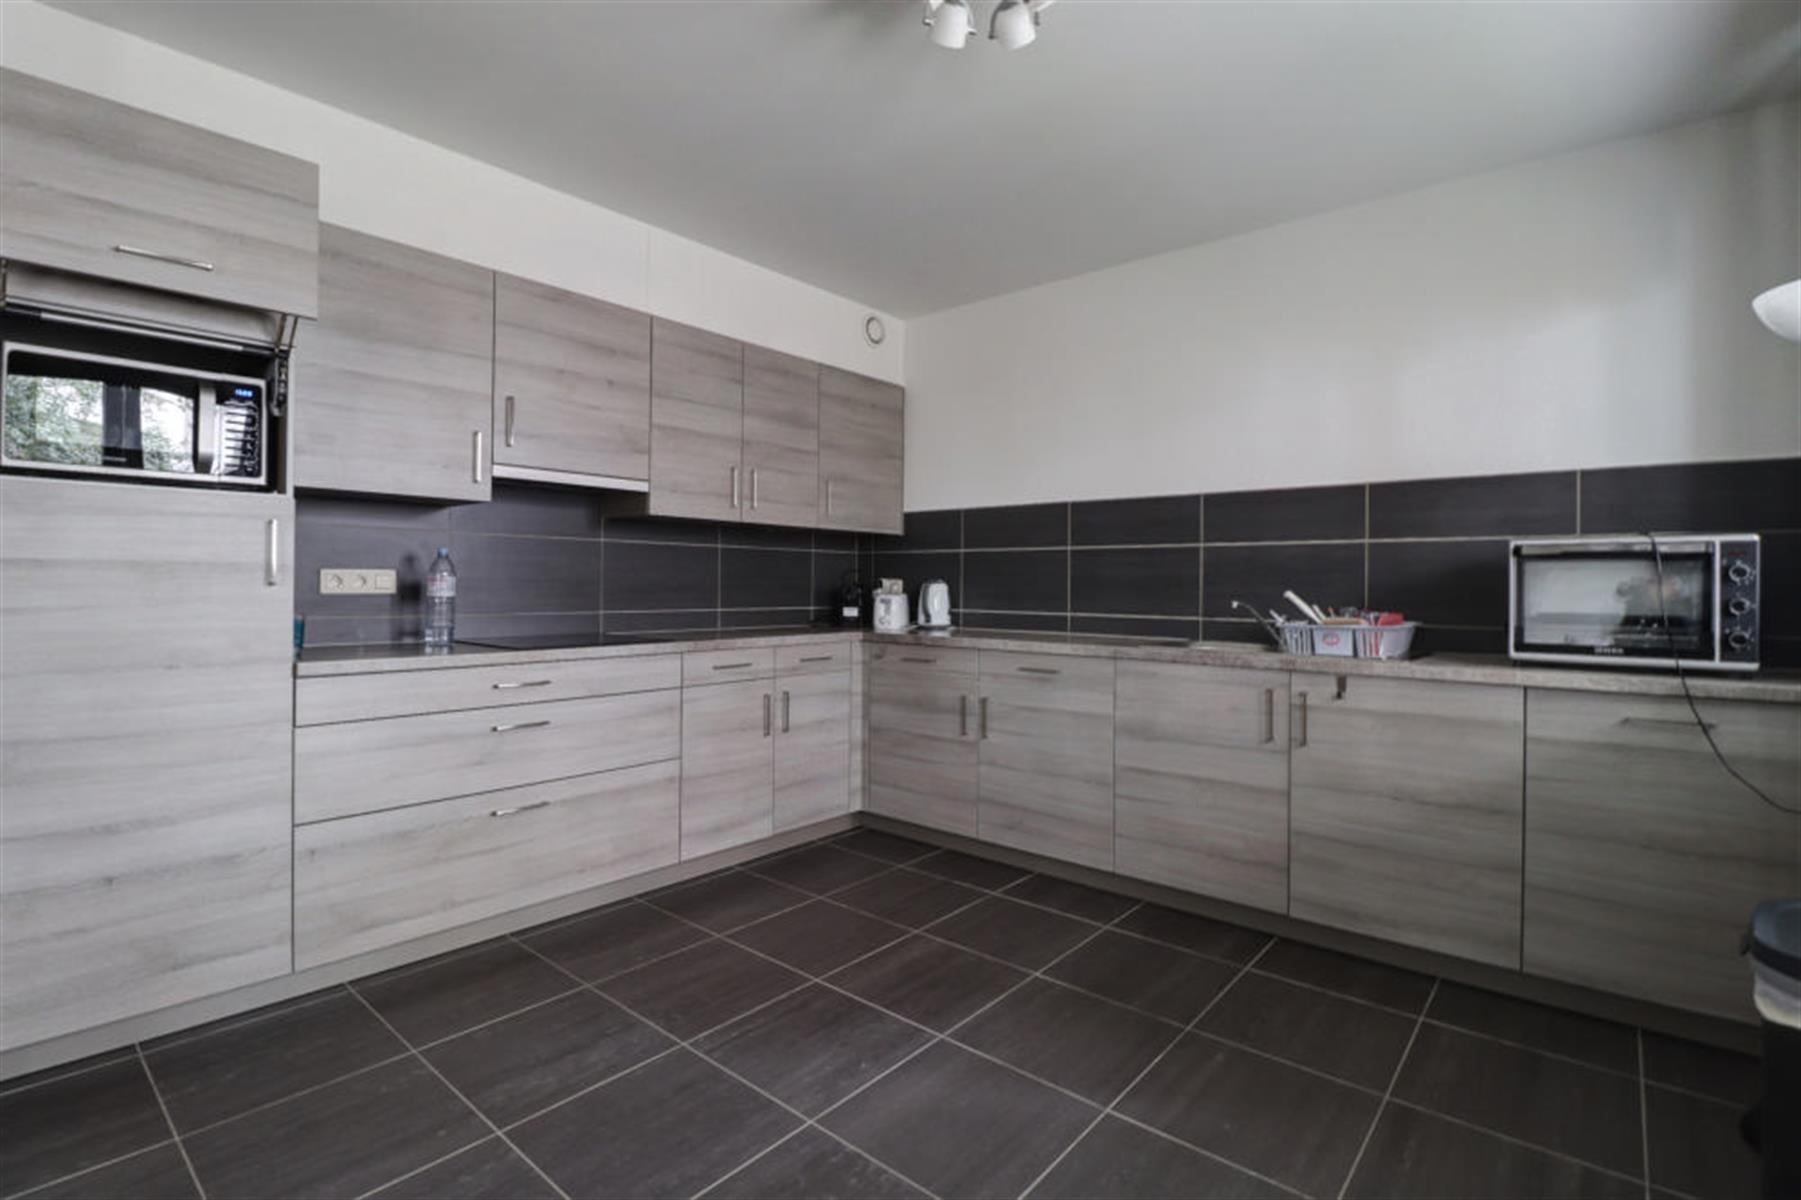 Flat - Etterbeek - #3905829-6